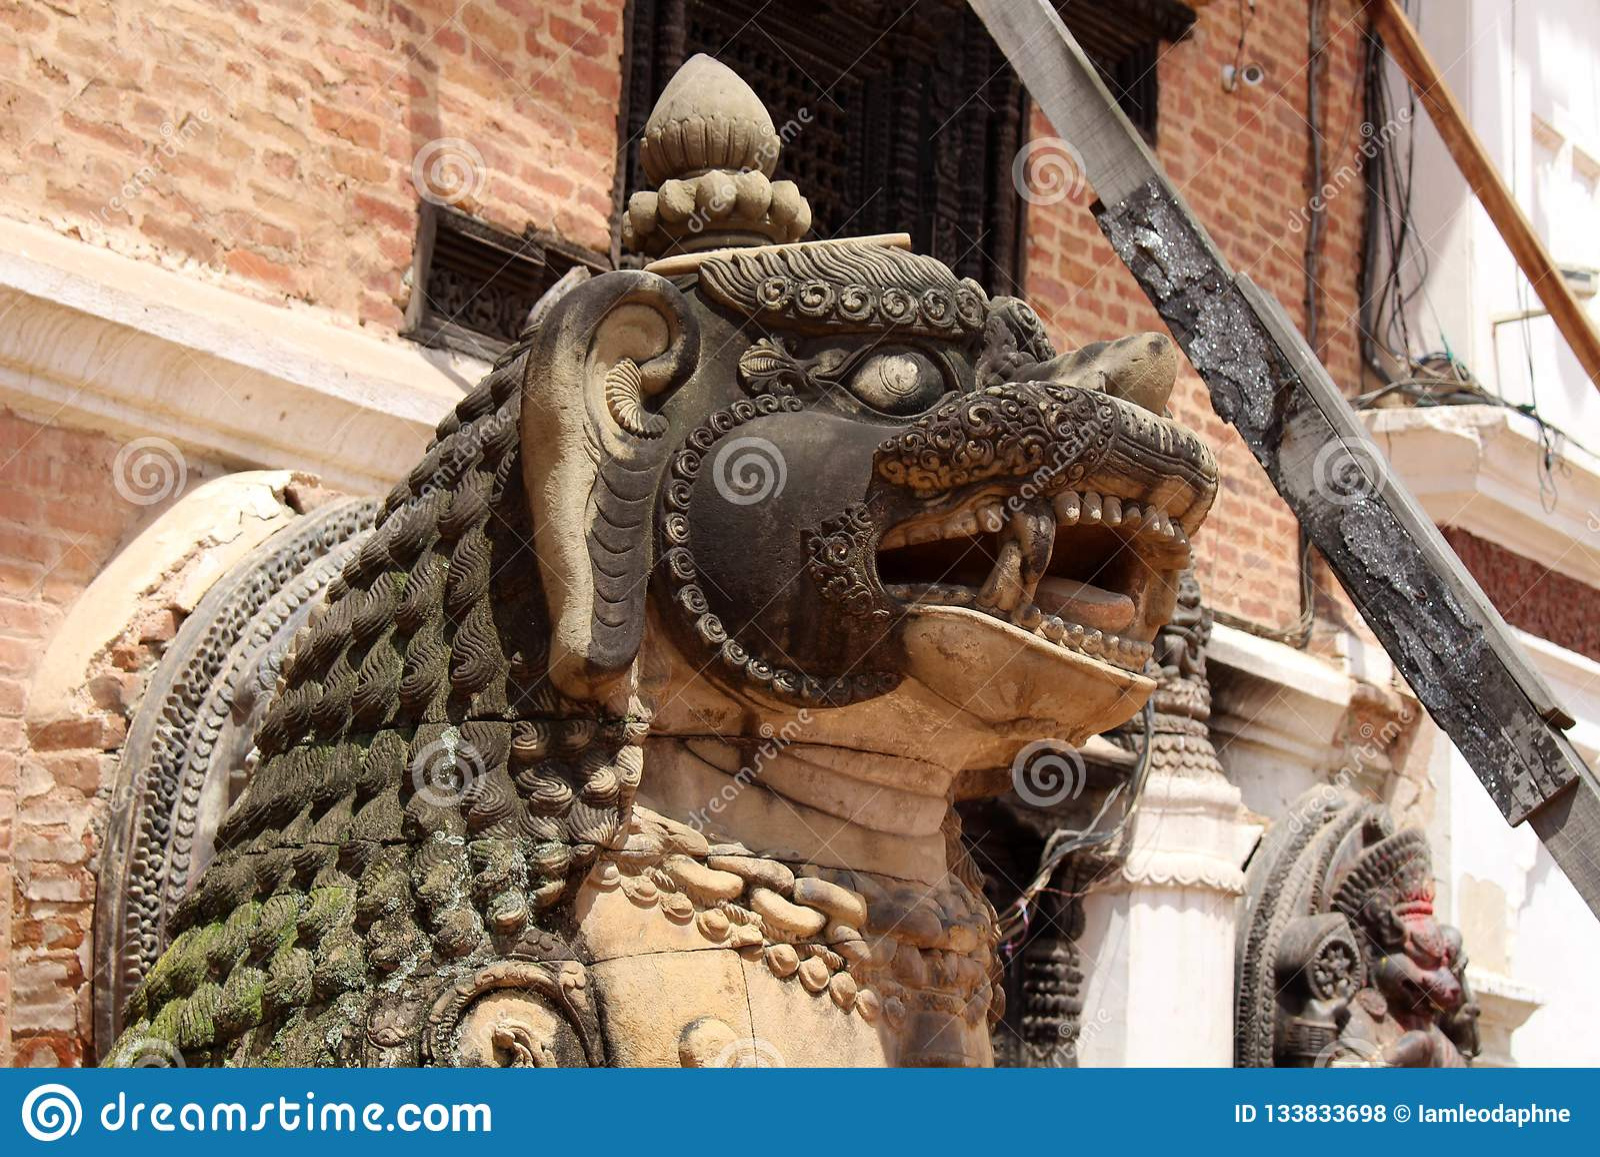 Translation: The lion like statues around Bhaktapur Durbar Square